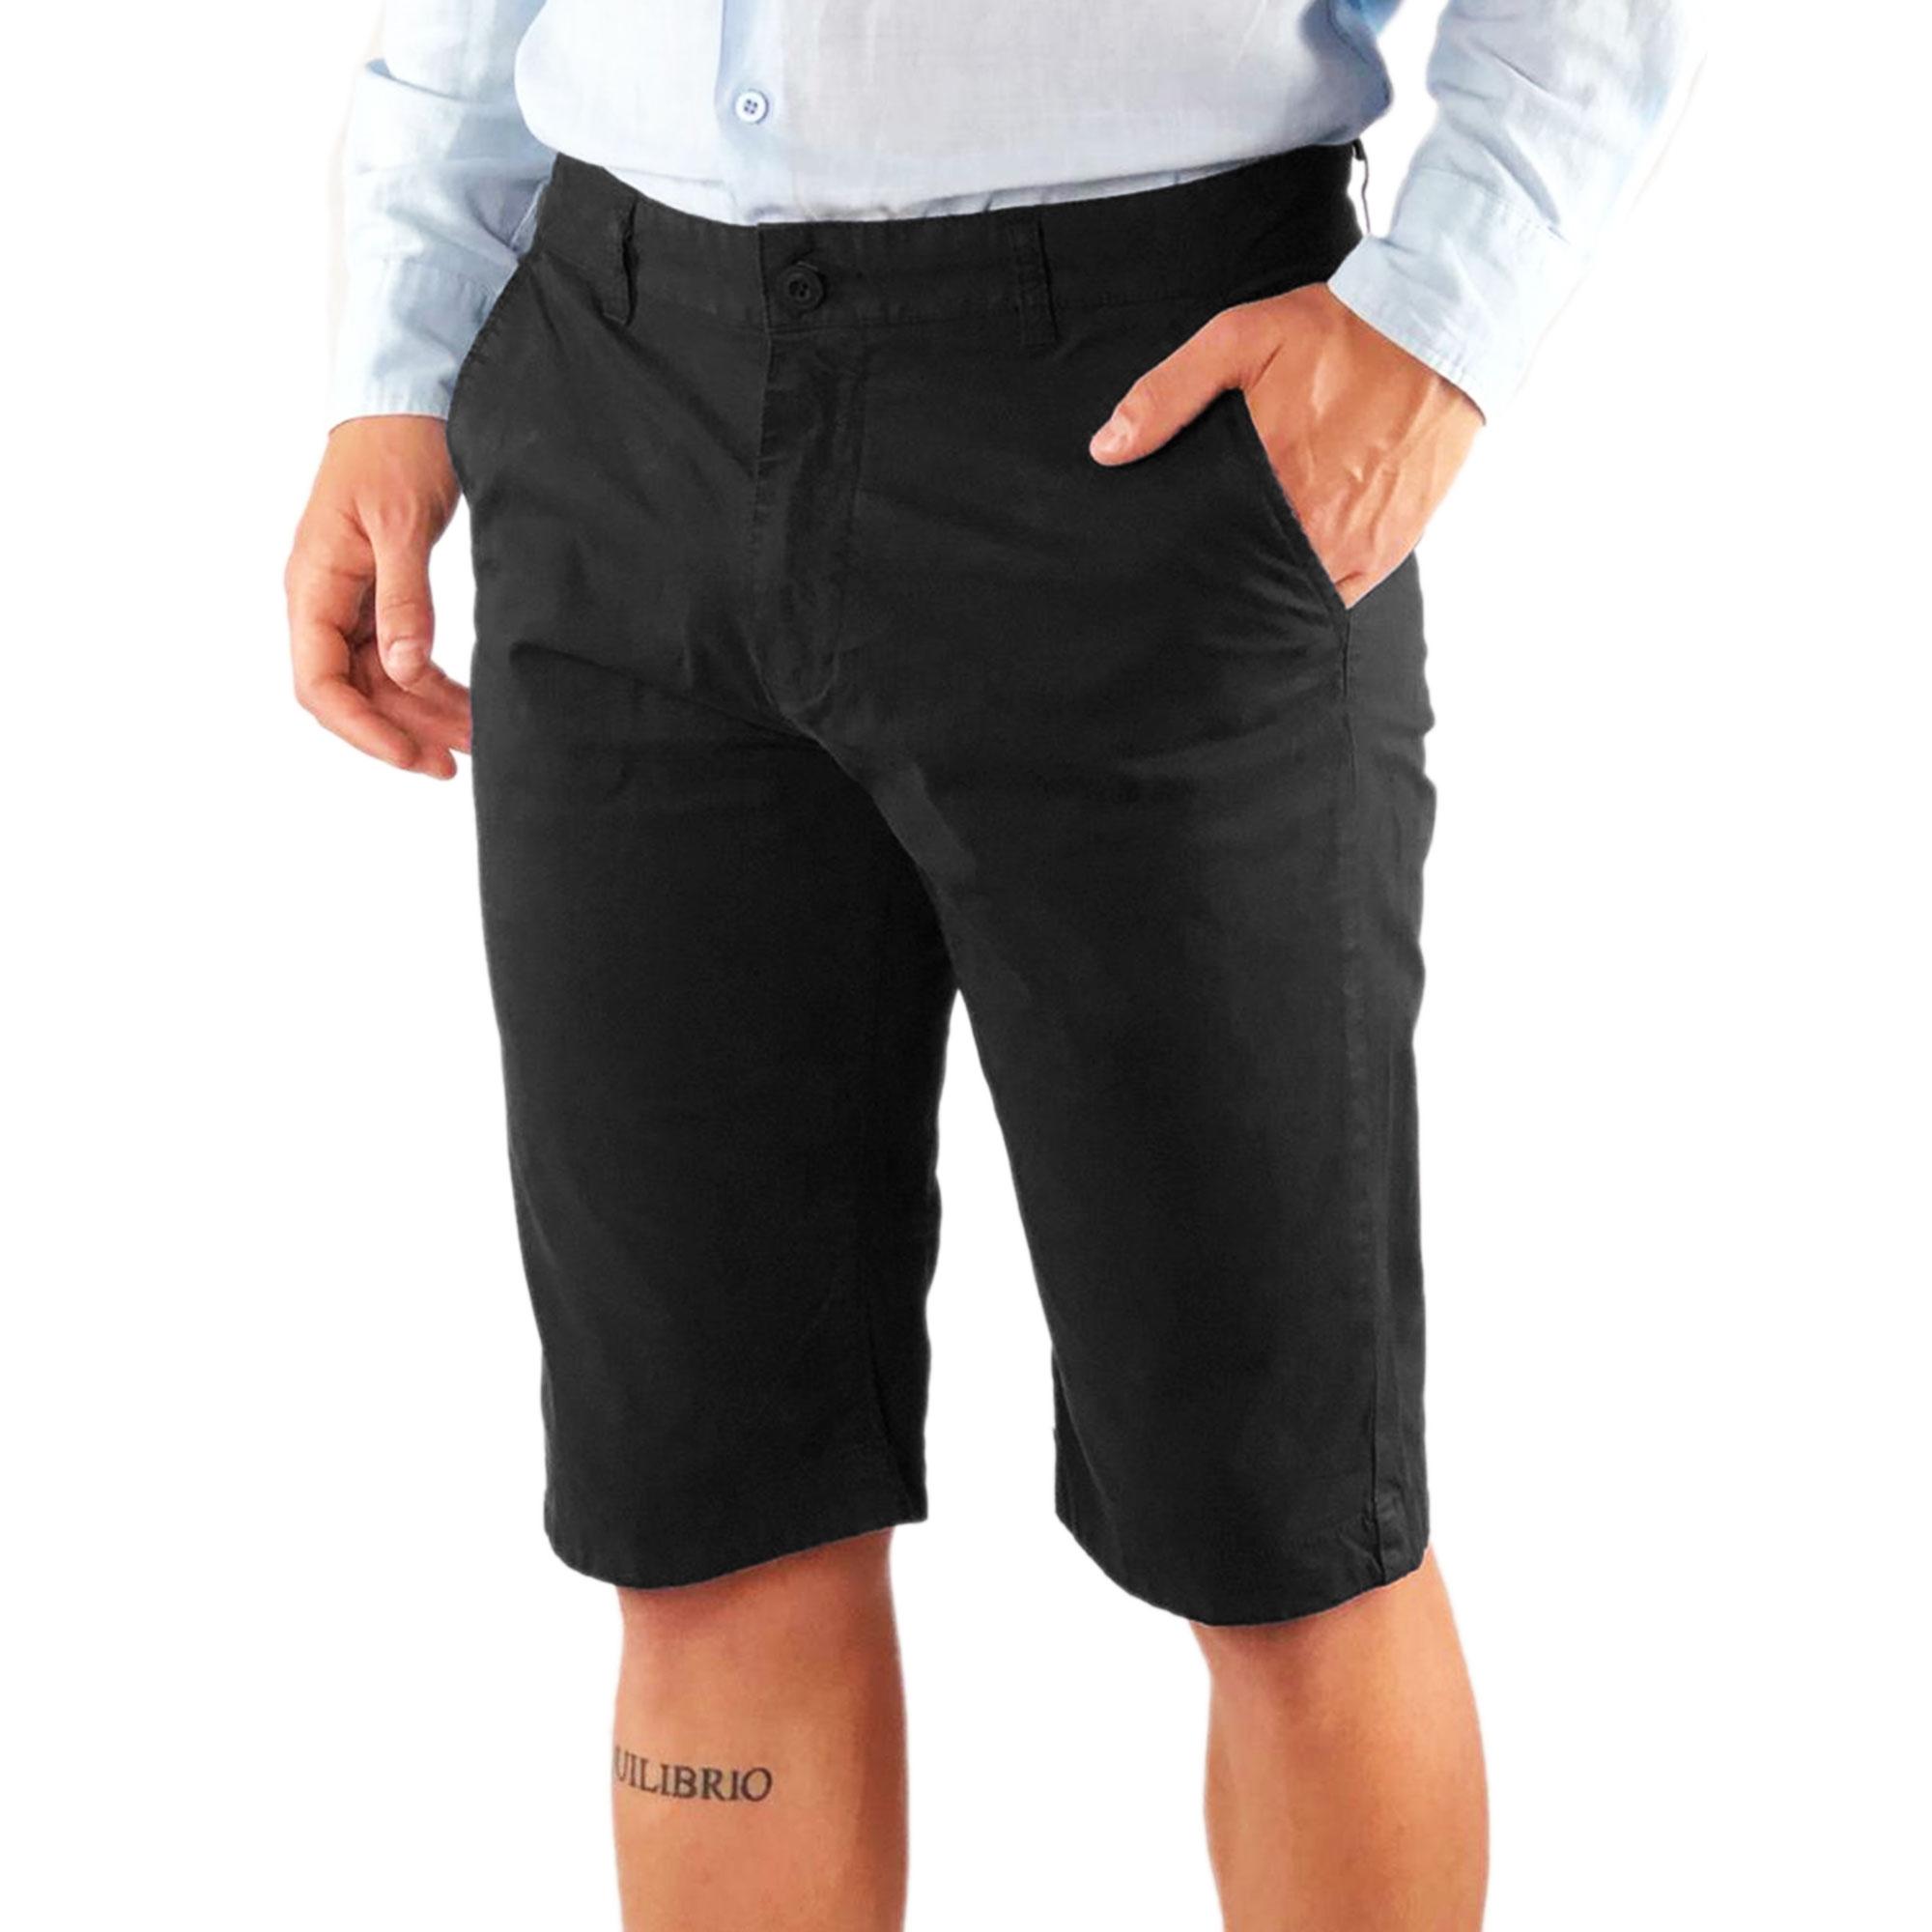 Bermuda-Uomo-Cotone-Slim-Fit-Jeans-Pantalone-Corto-Shorts-Pantaloncini-Casual miniatura 10